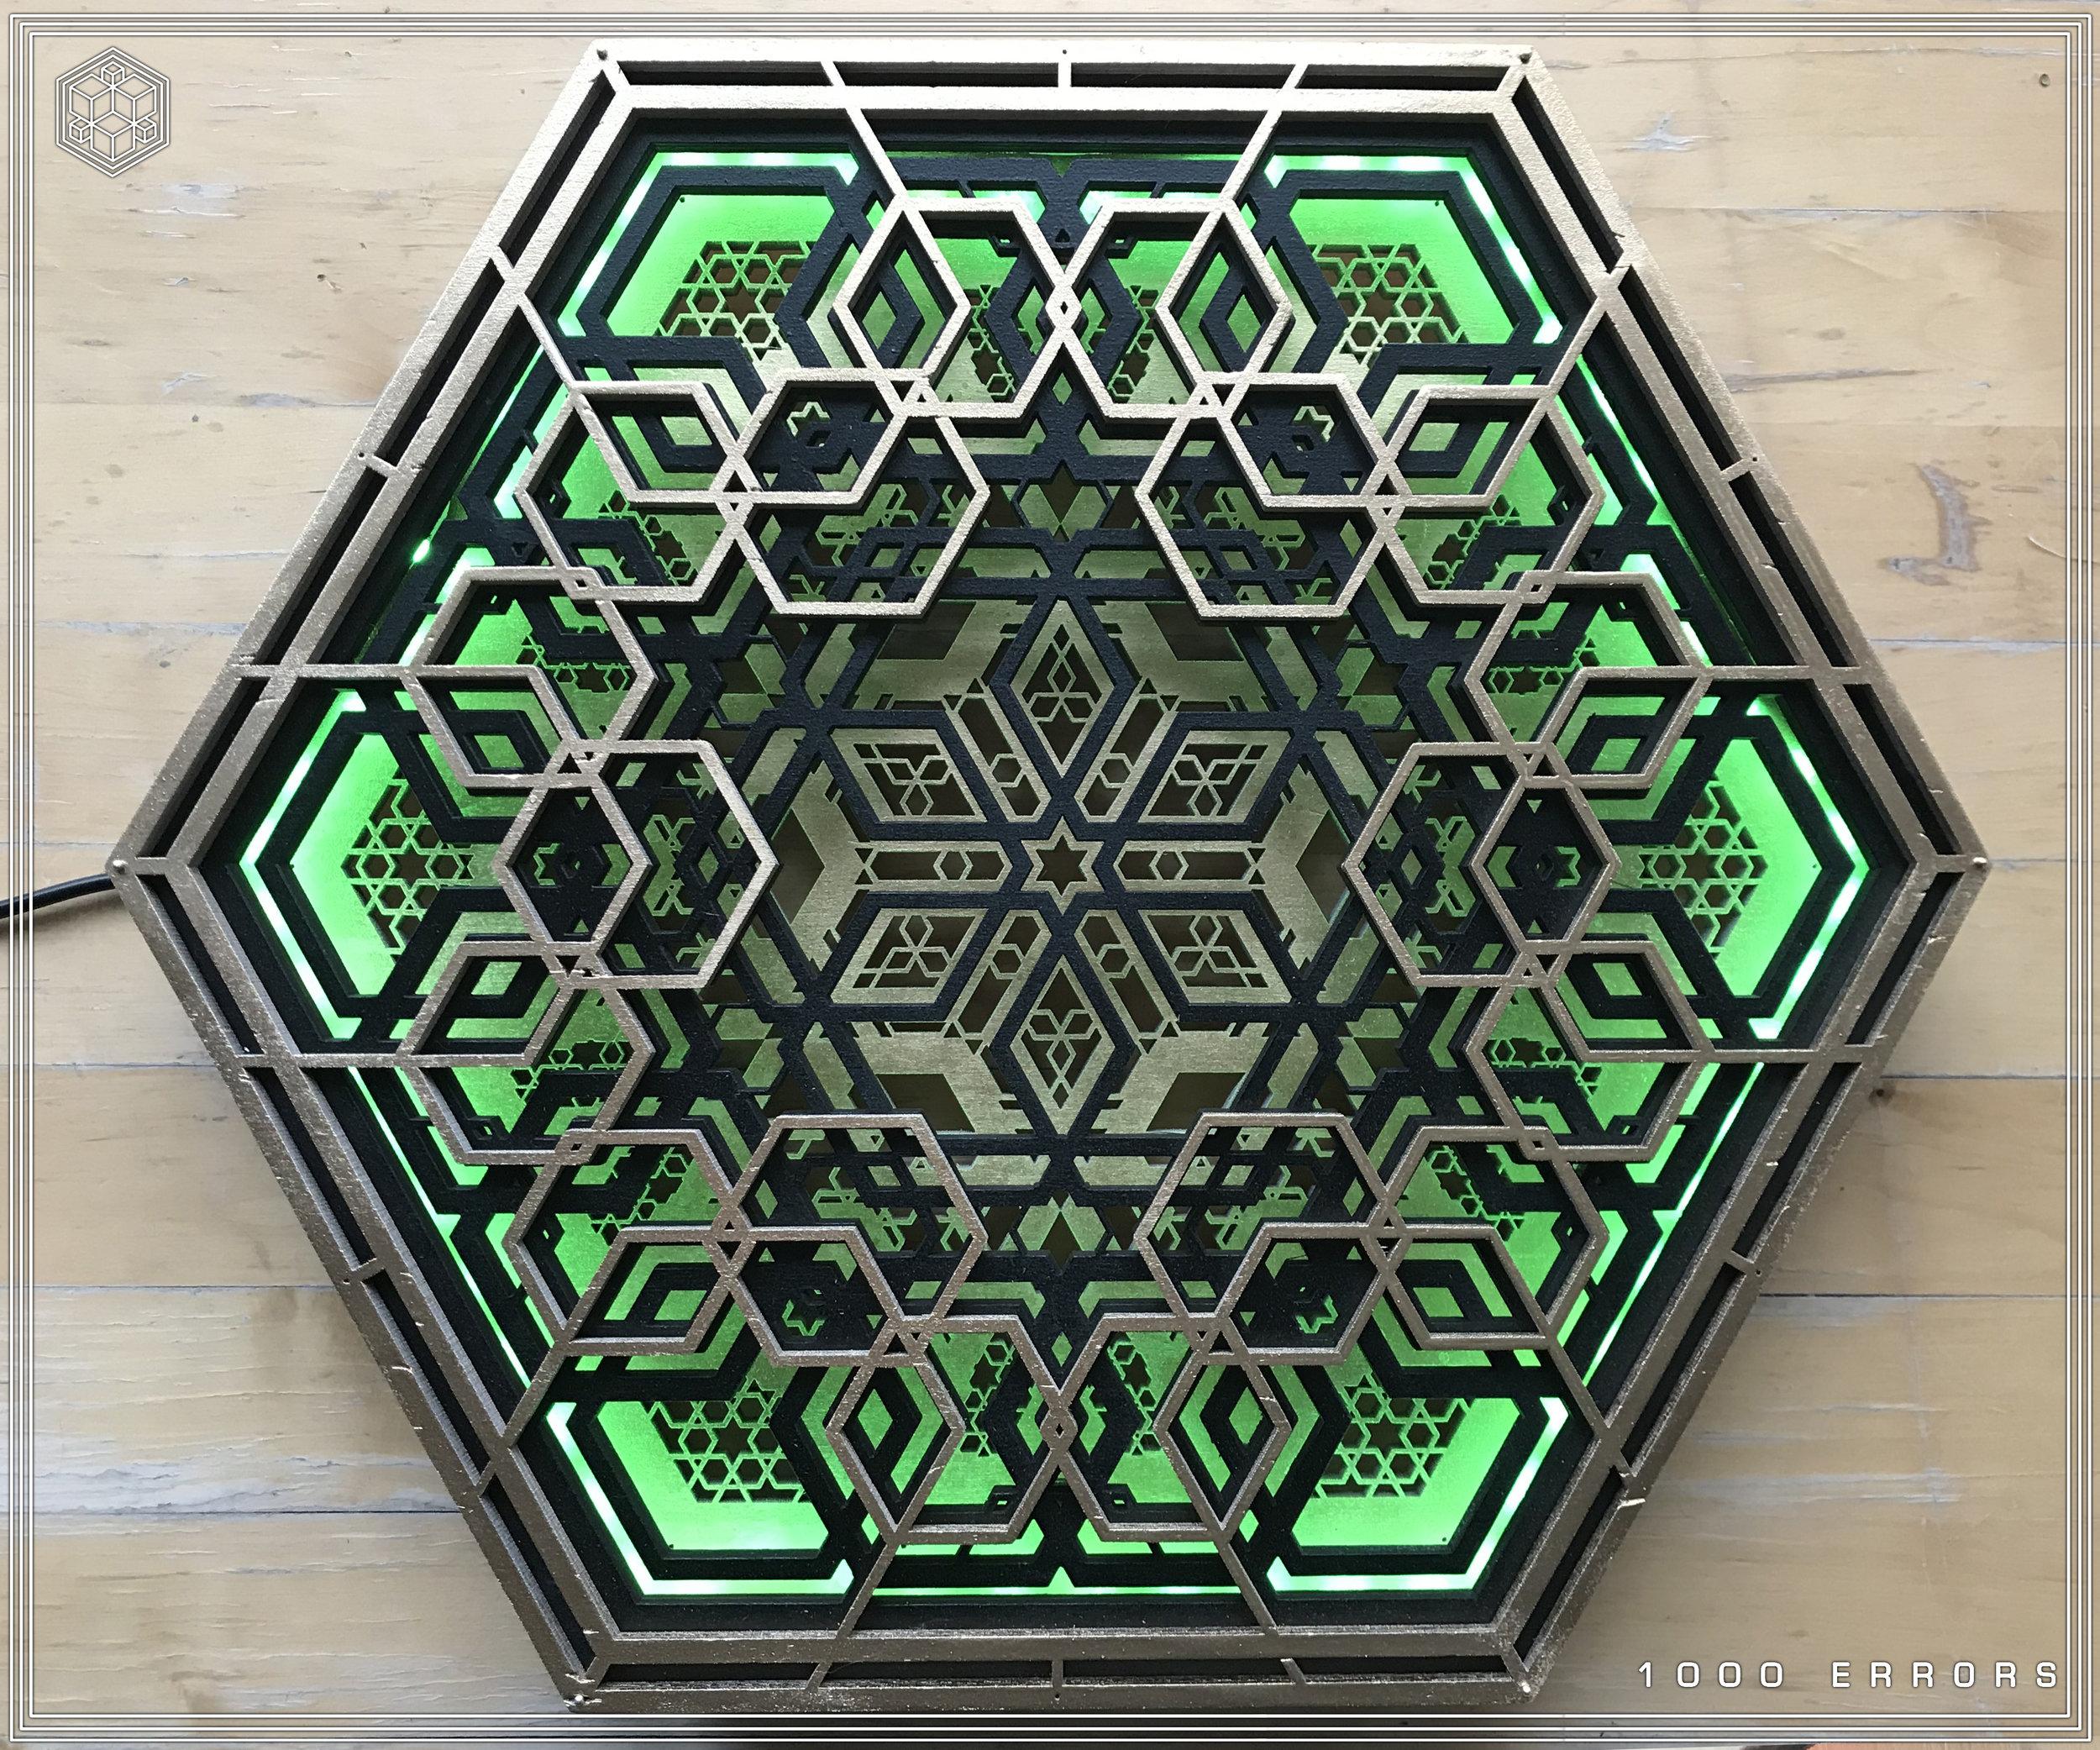 Geometric, wood, woodwork, cnc, cad, maya, rhino, procedural, generative, geometry, sacred,hexagon, platonic, solid, psy, psychedelic, art, clock, shop, buy, sale, store, discount,metaphysical, spiritual, new39 .jpg